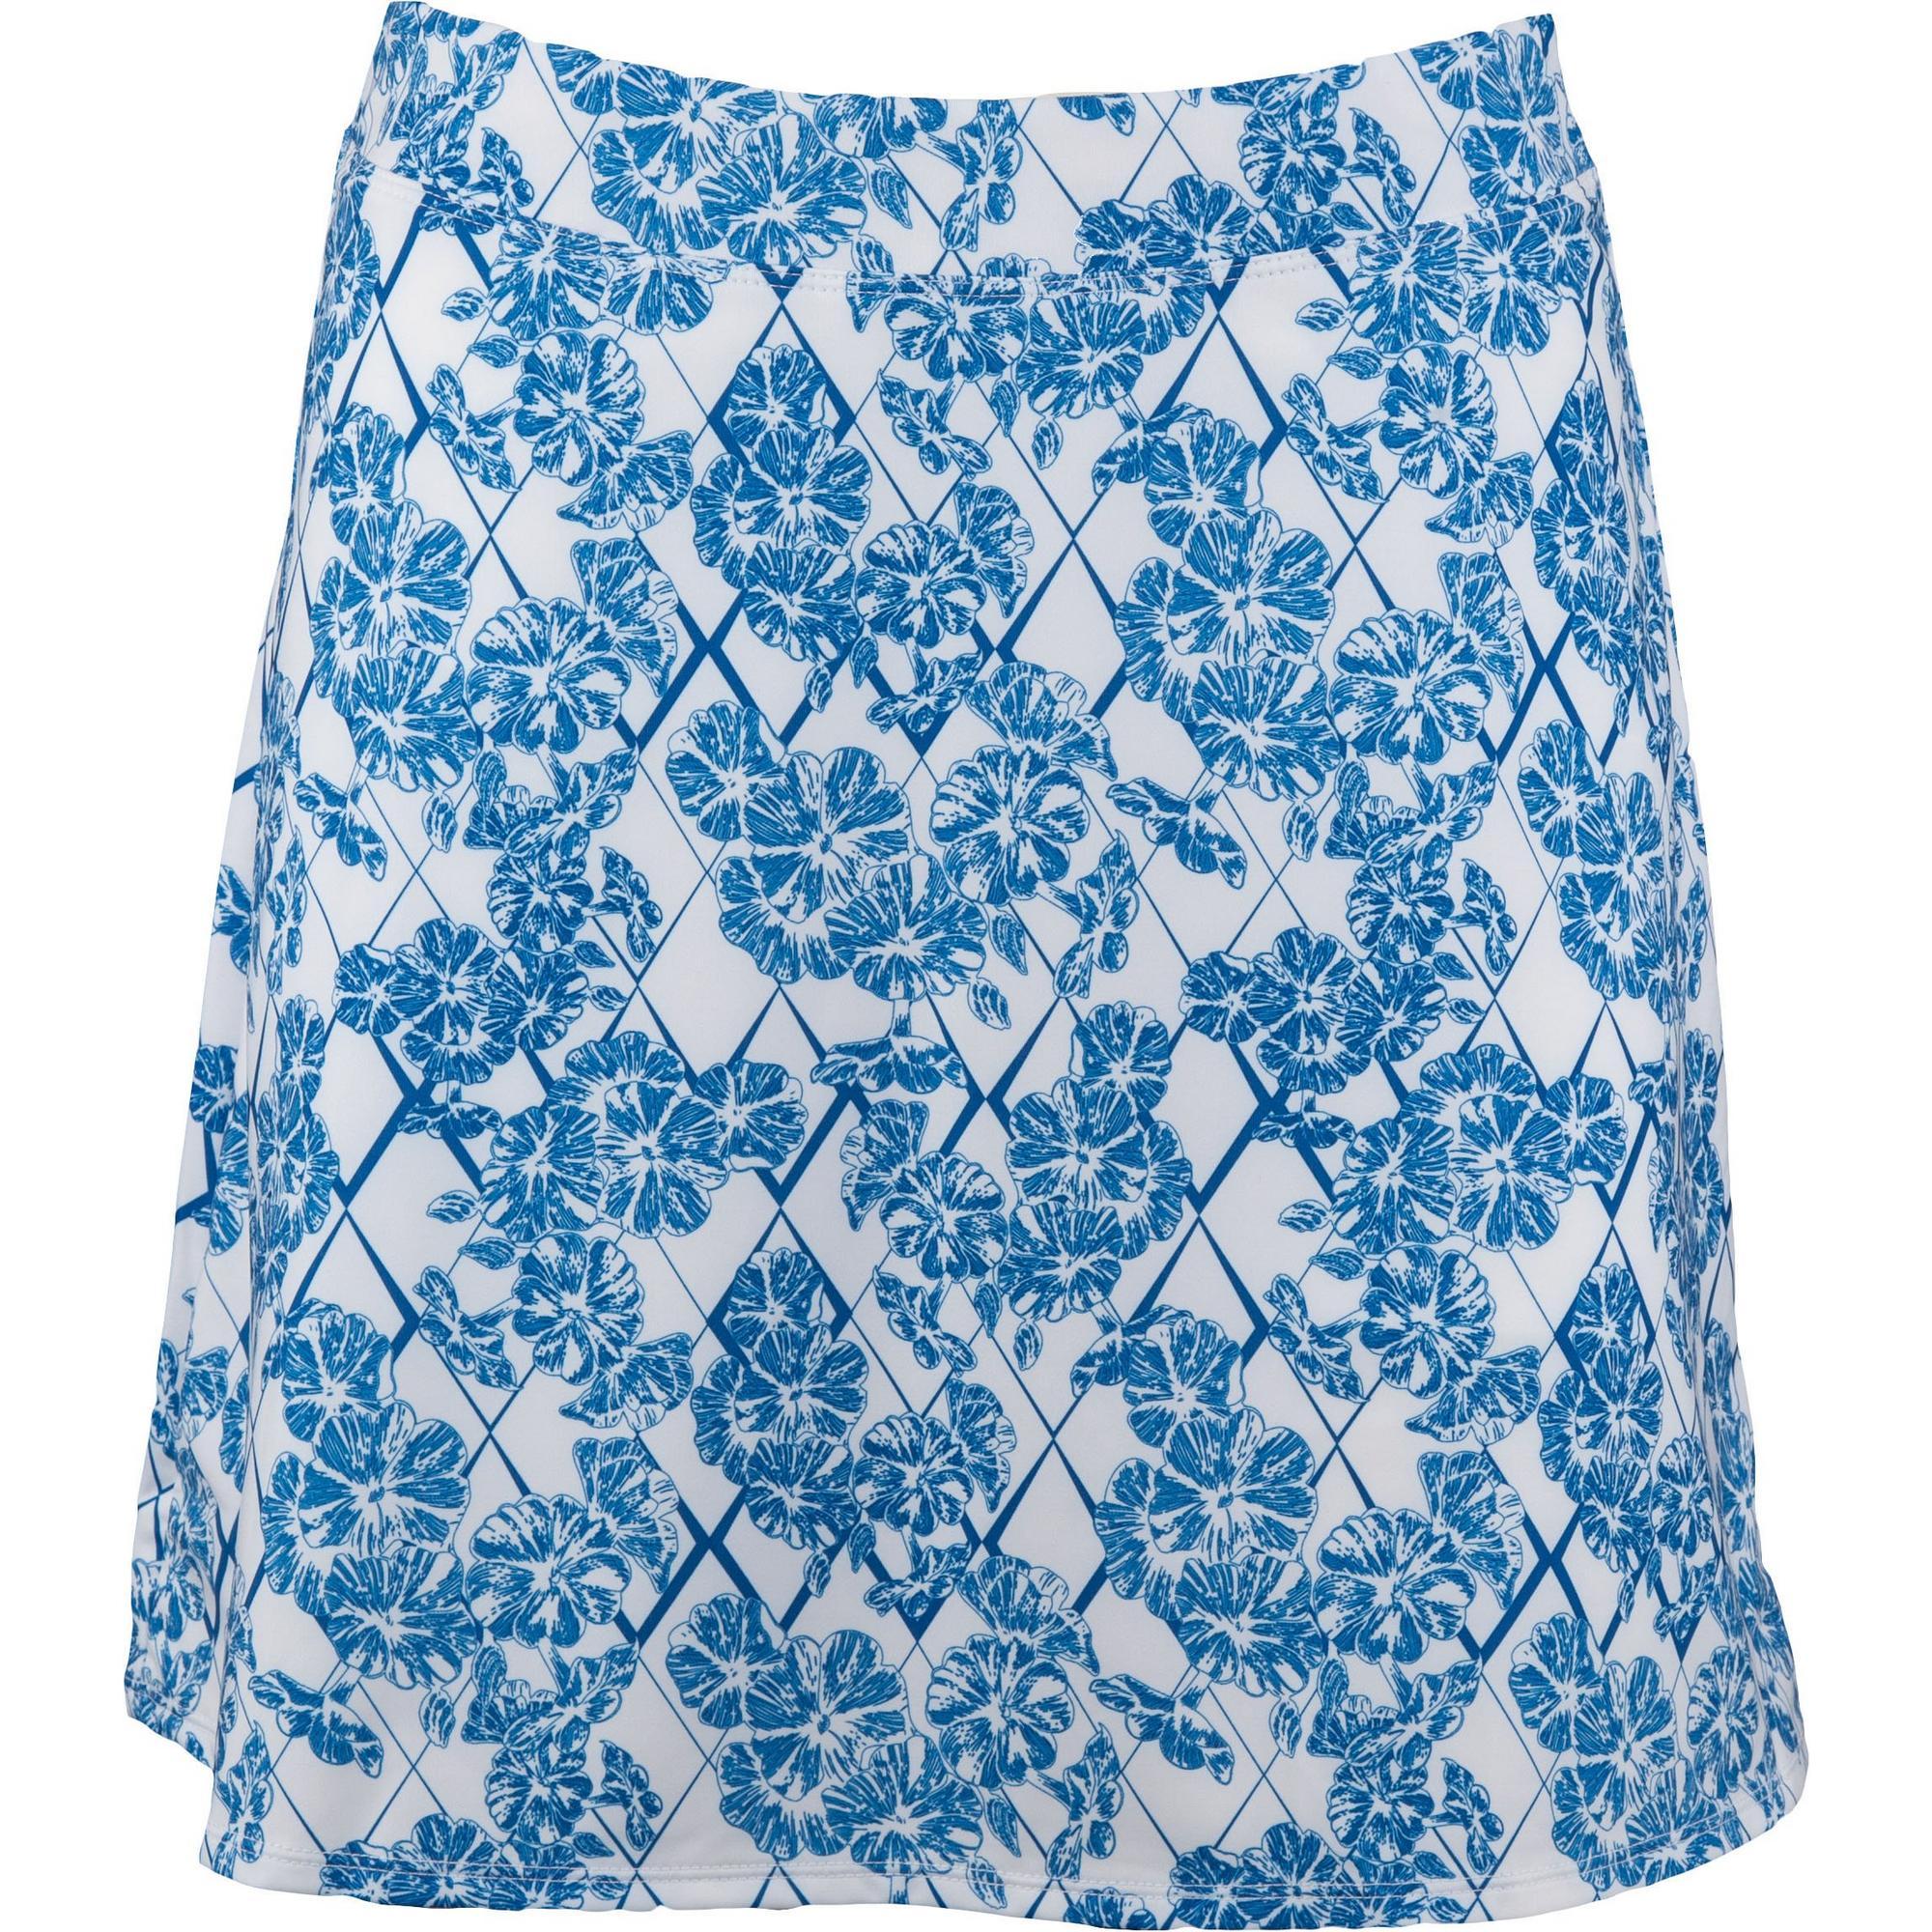 Women's Floral Print Swing Knit Skort